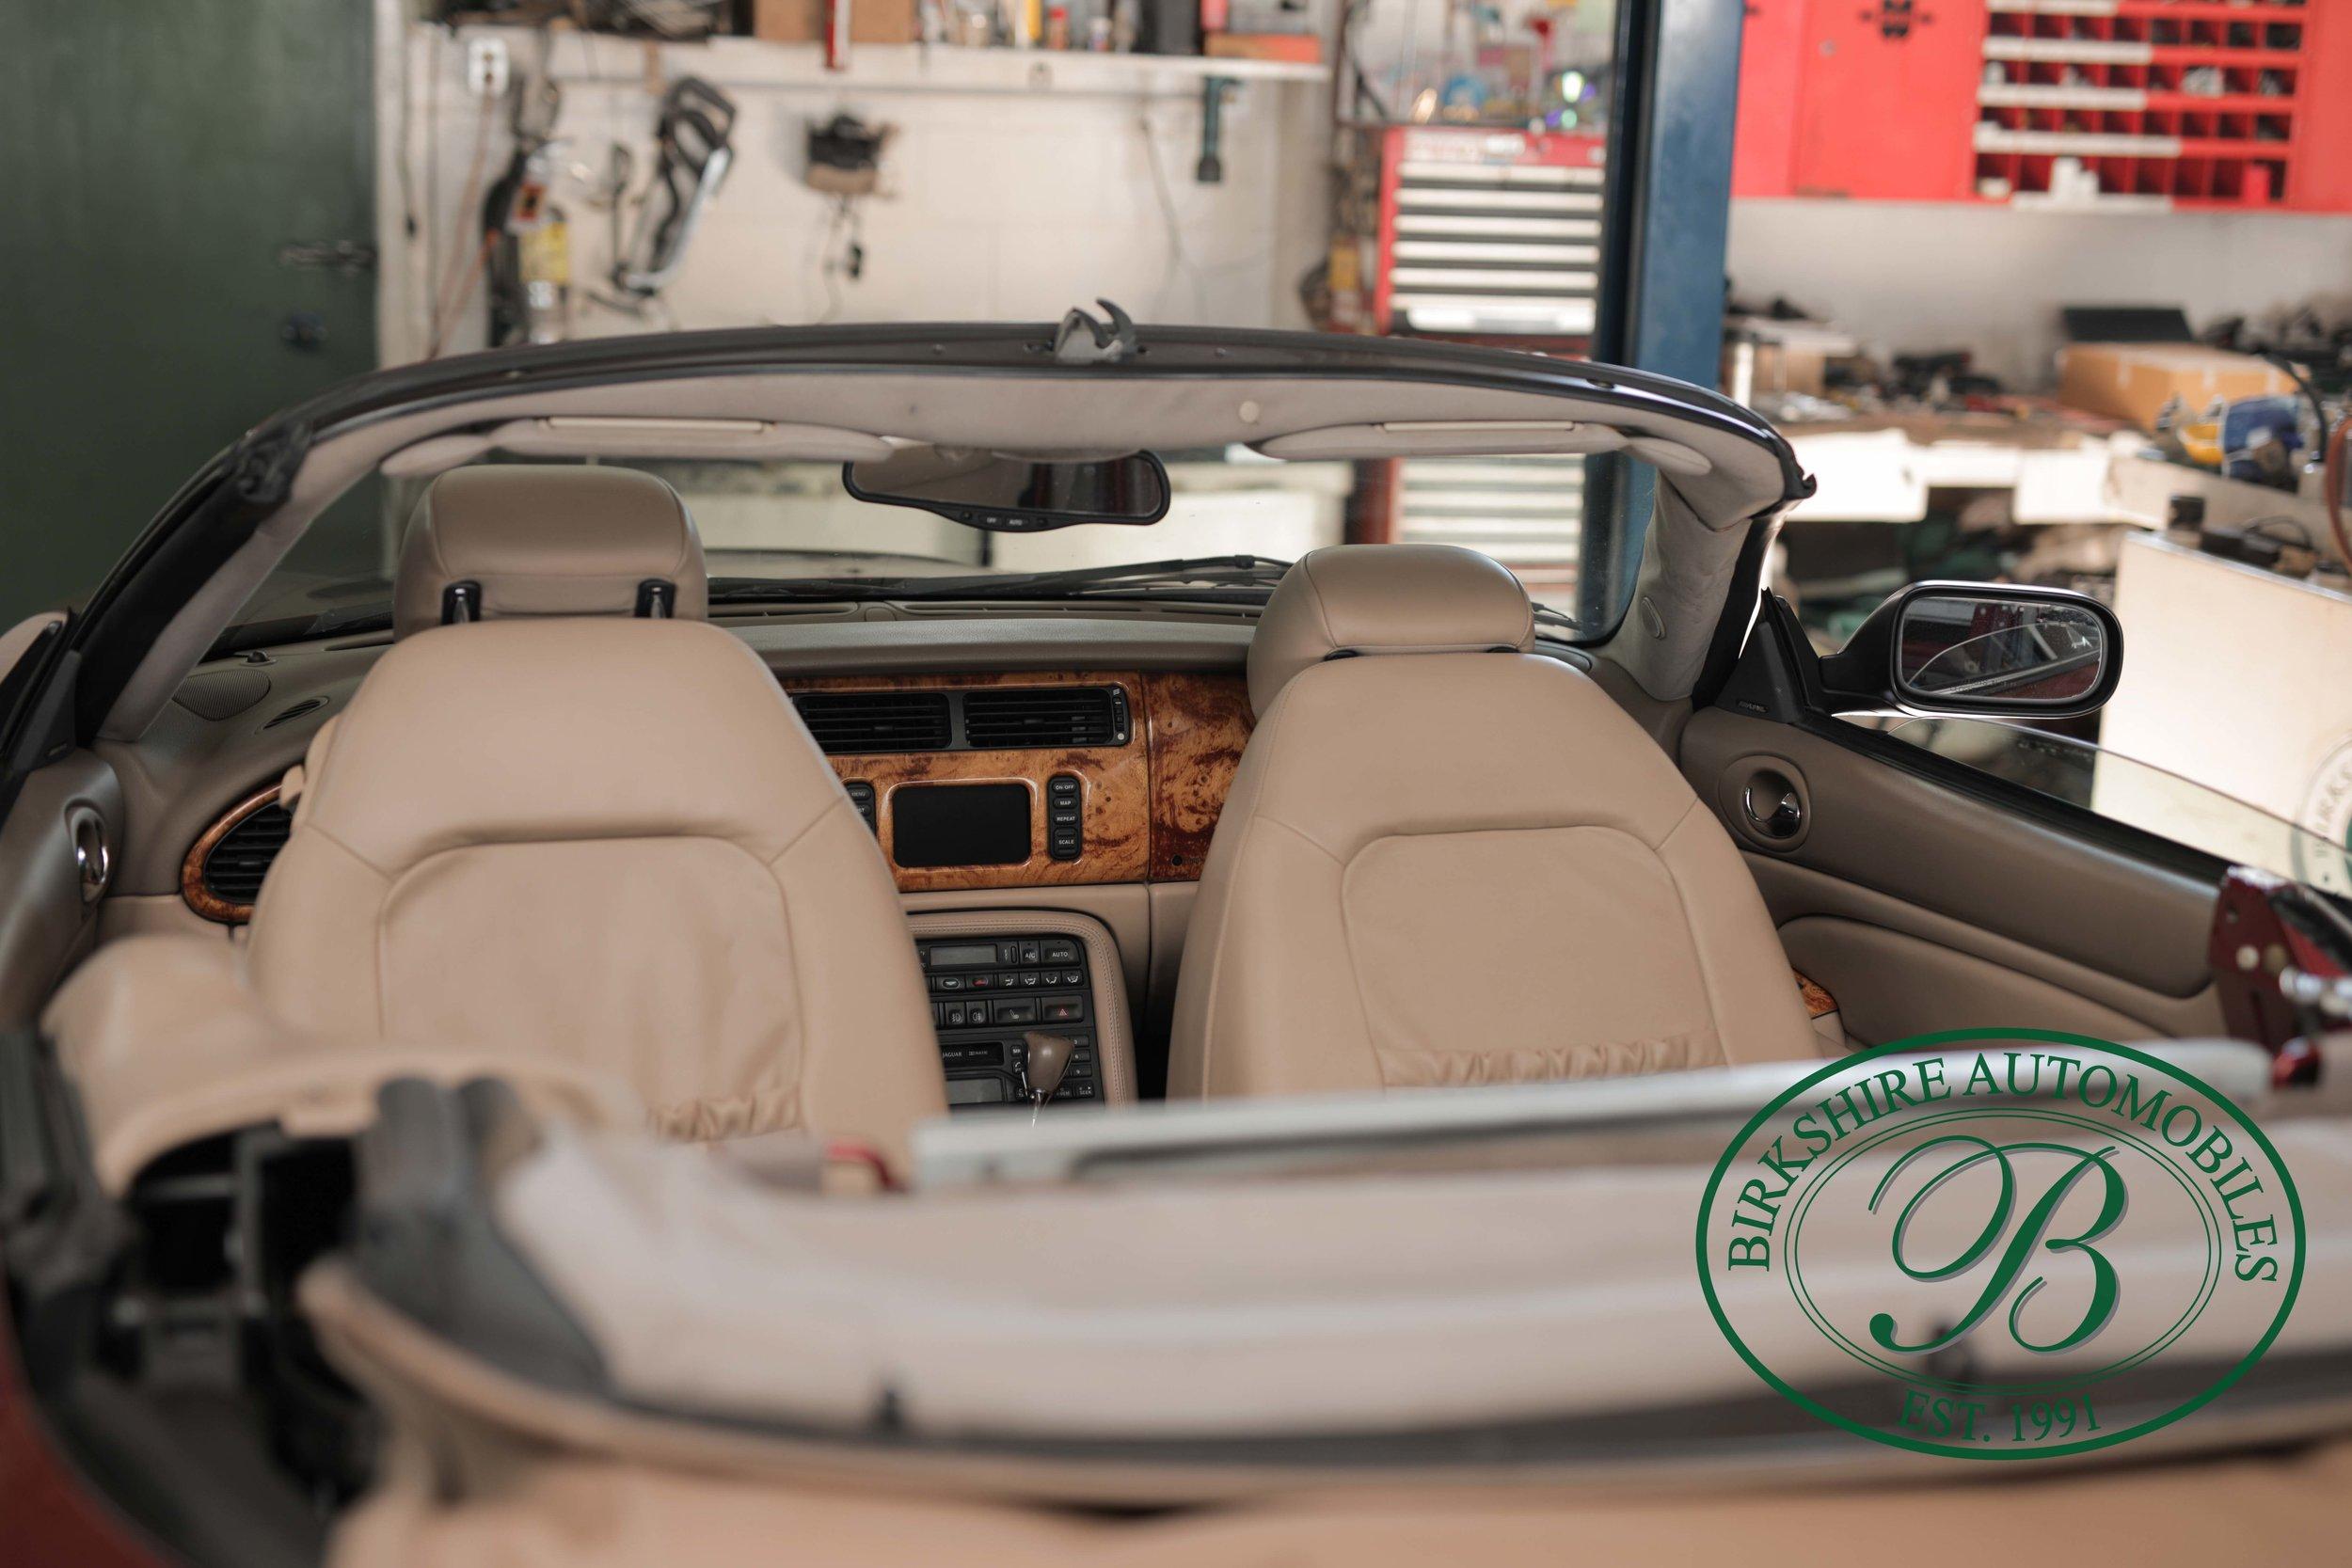 Birkshire Automobiles Britsh Car Service 2008 Jaguar XK8 Convertible-5.jpg